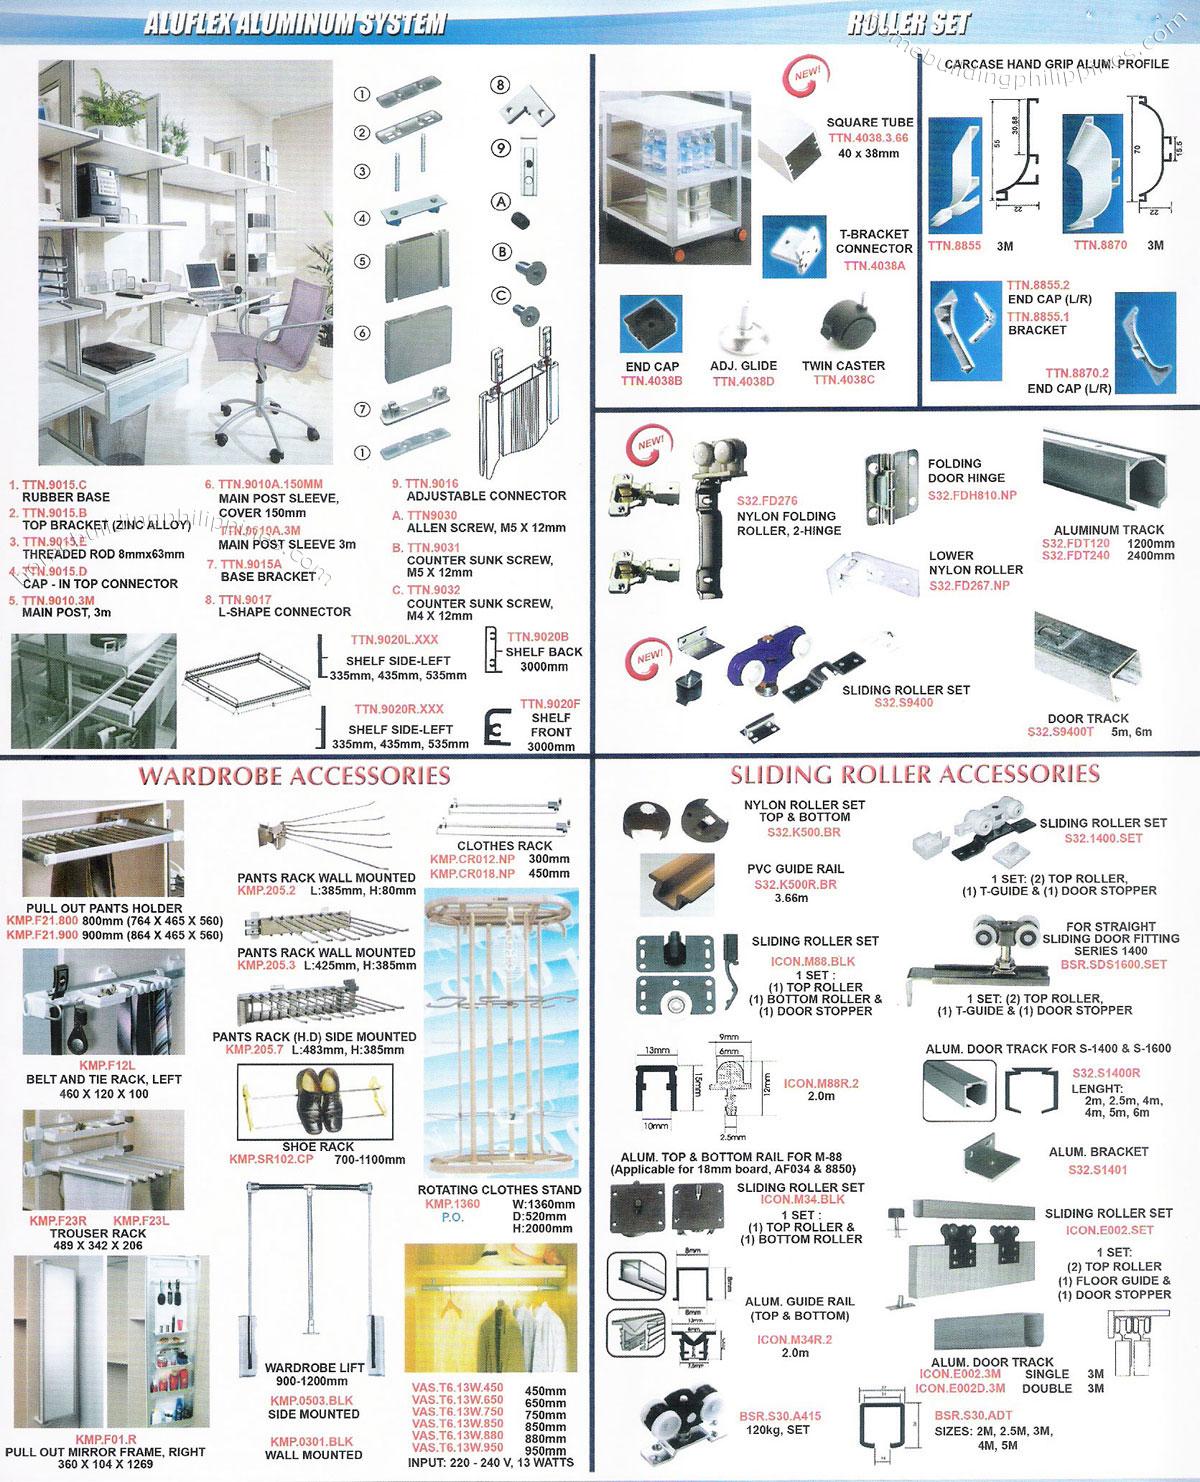 Aluflex Aluminum System Roller Set Wardrobe Accessories